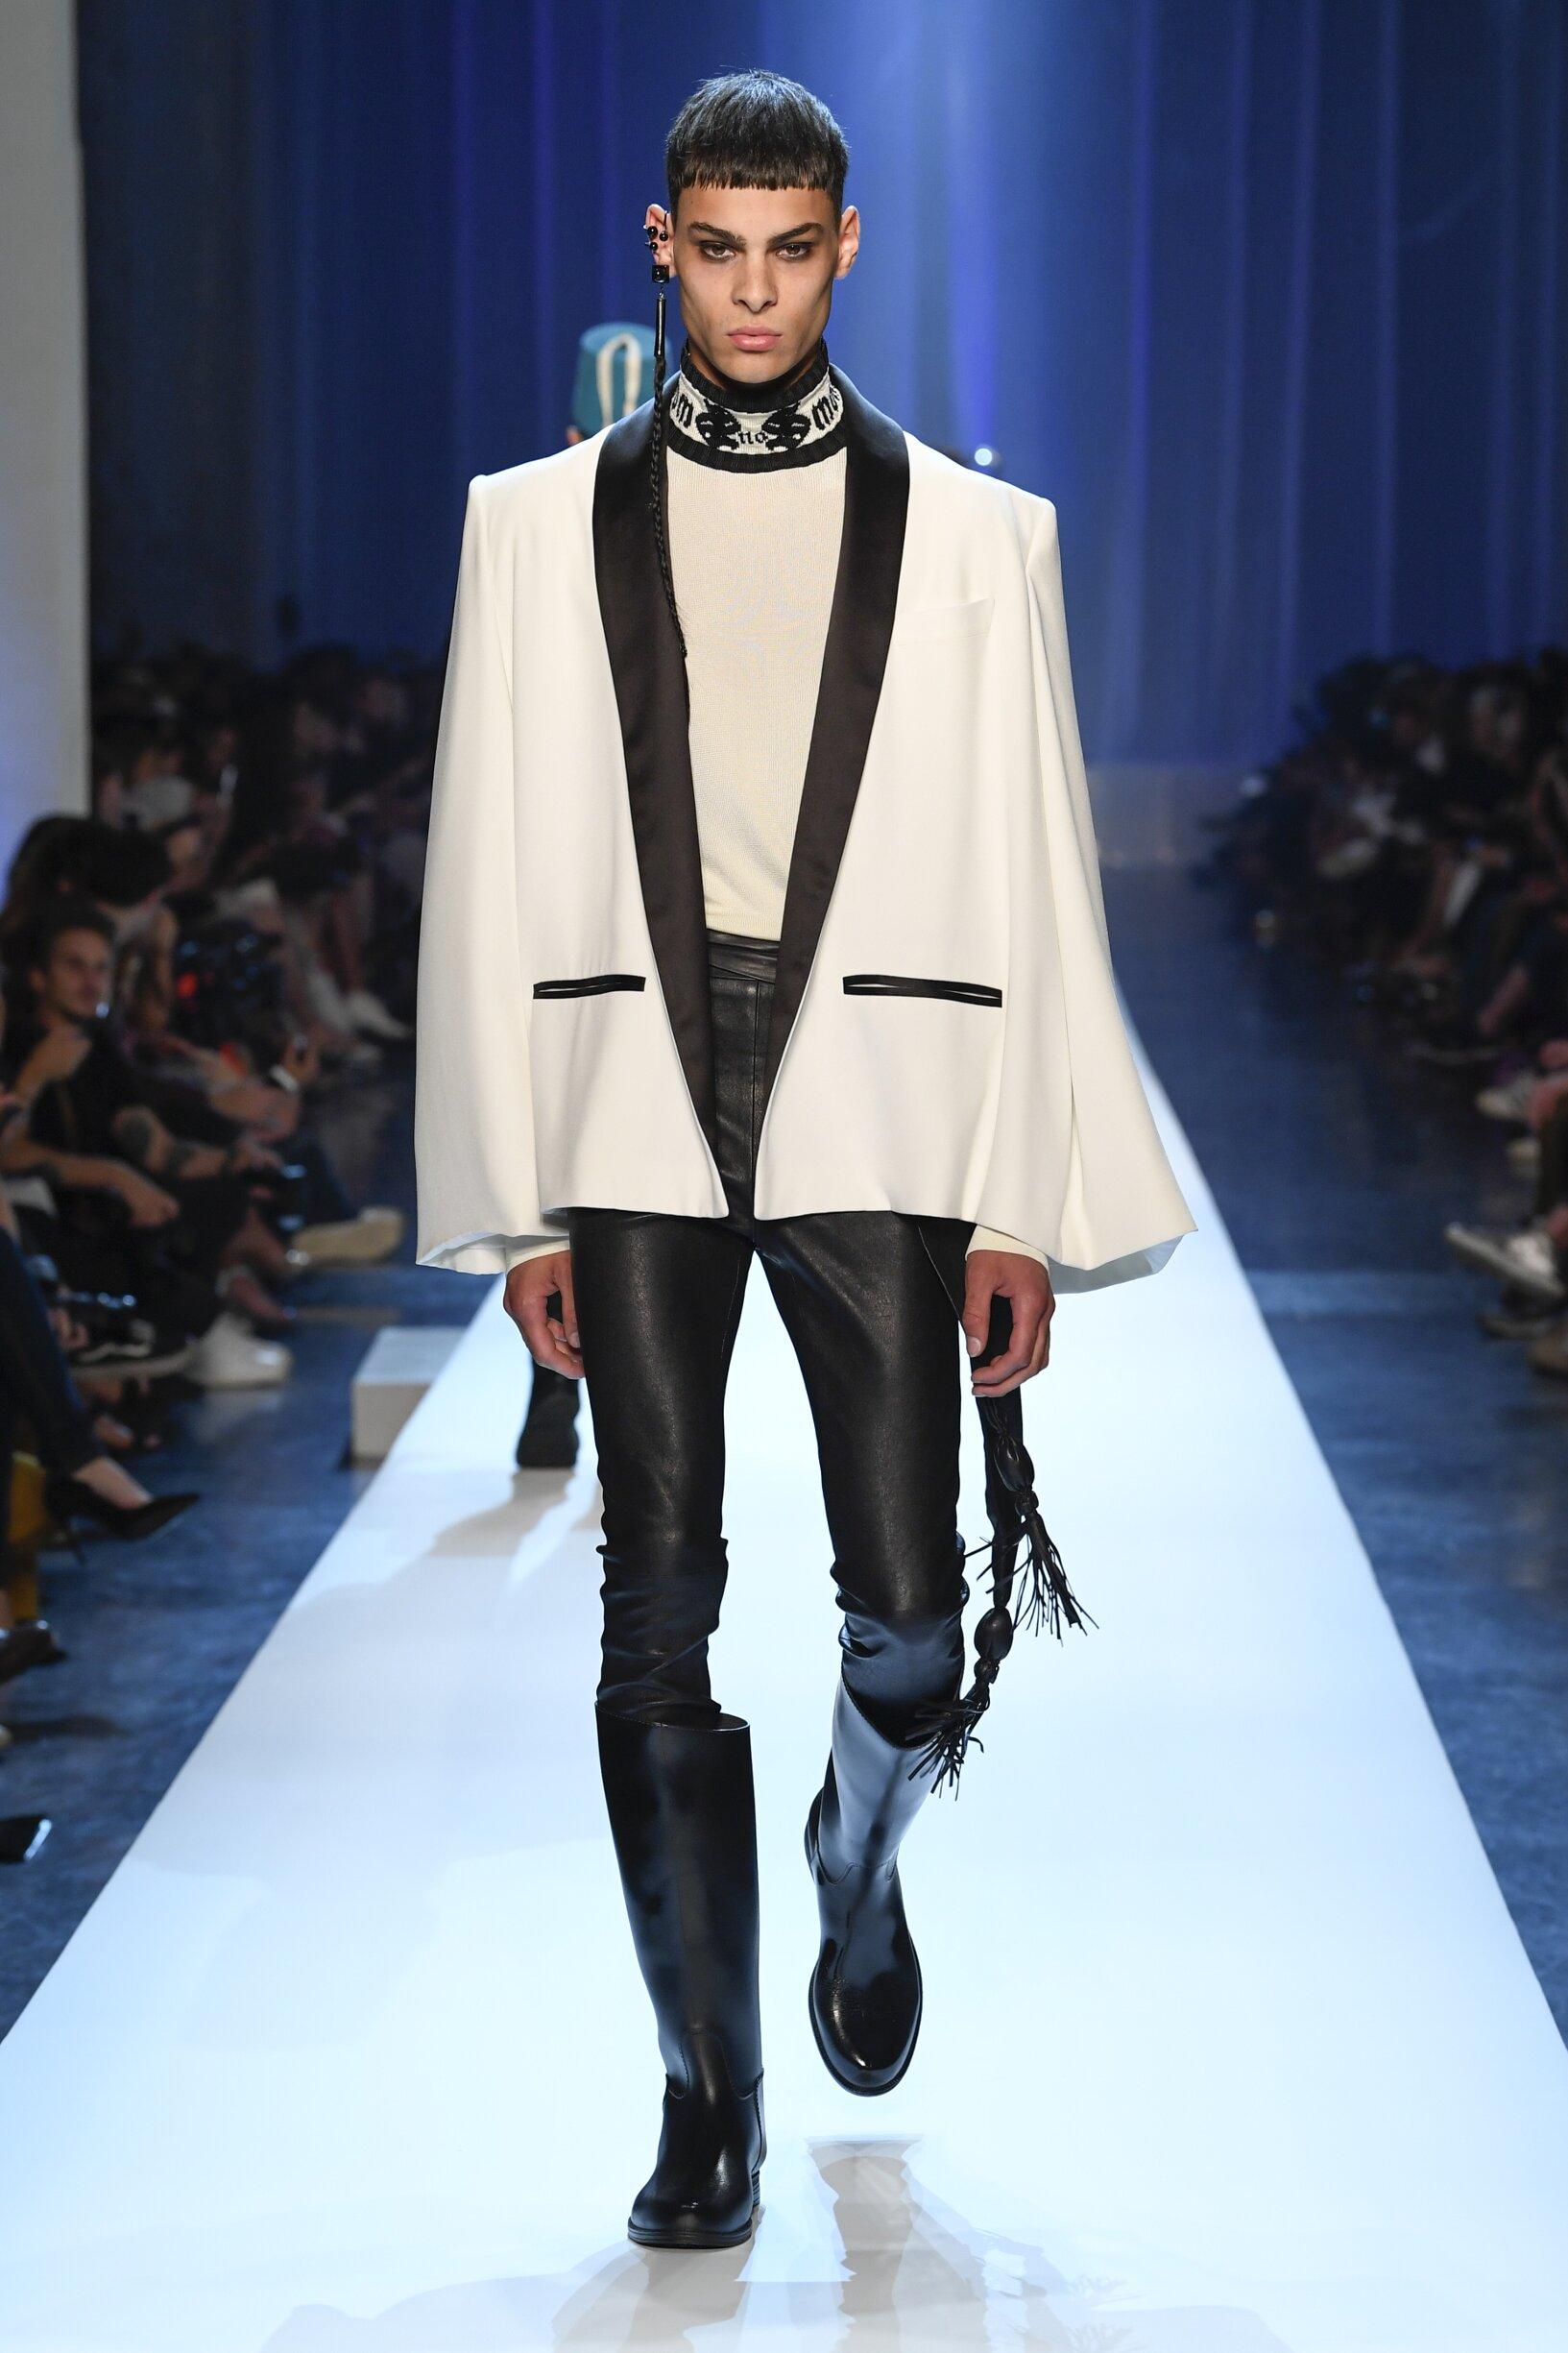 Jean-Paul Gaultier Haute Couture Catwalk